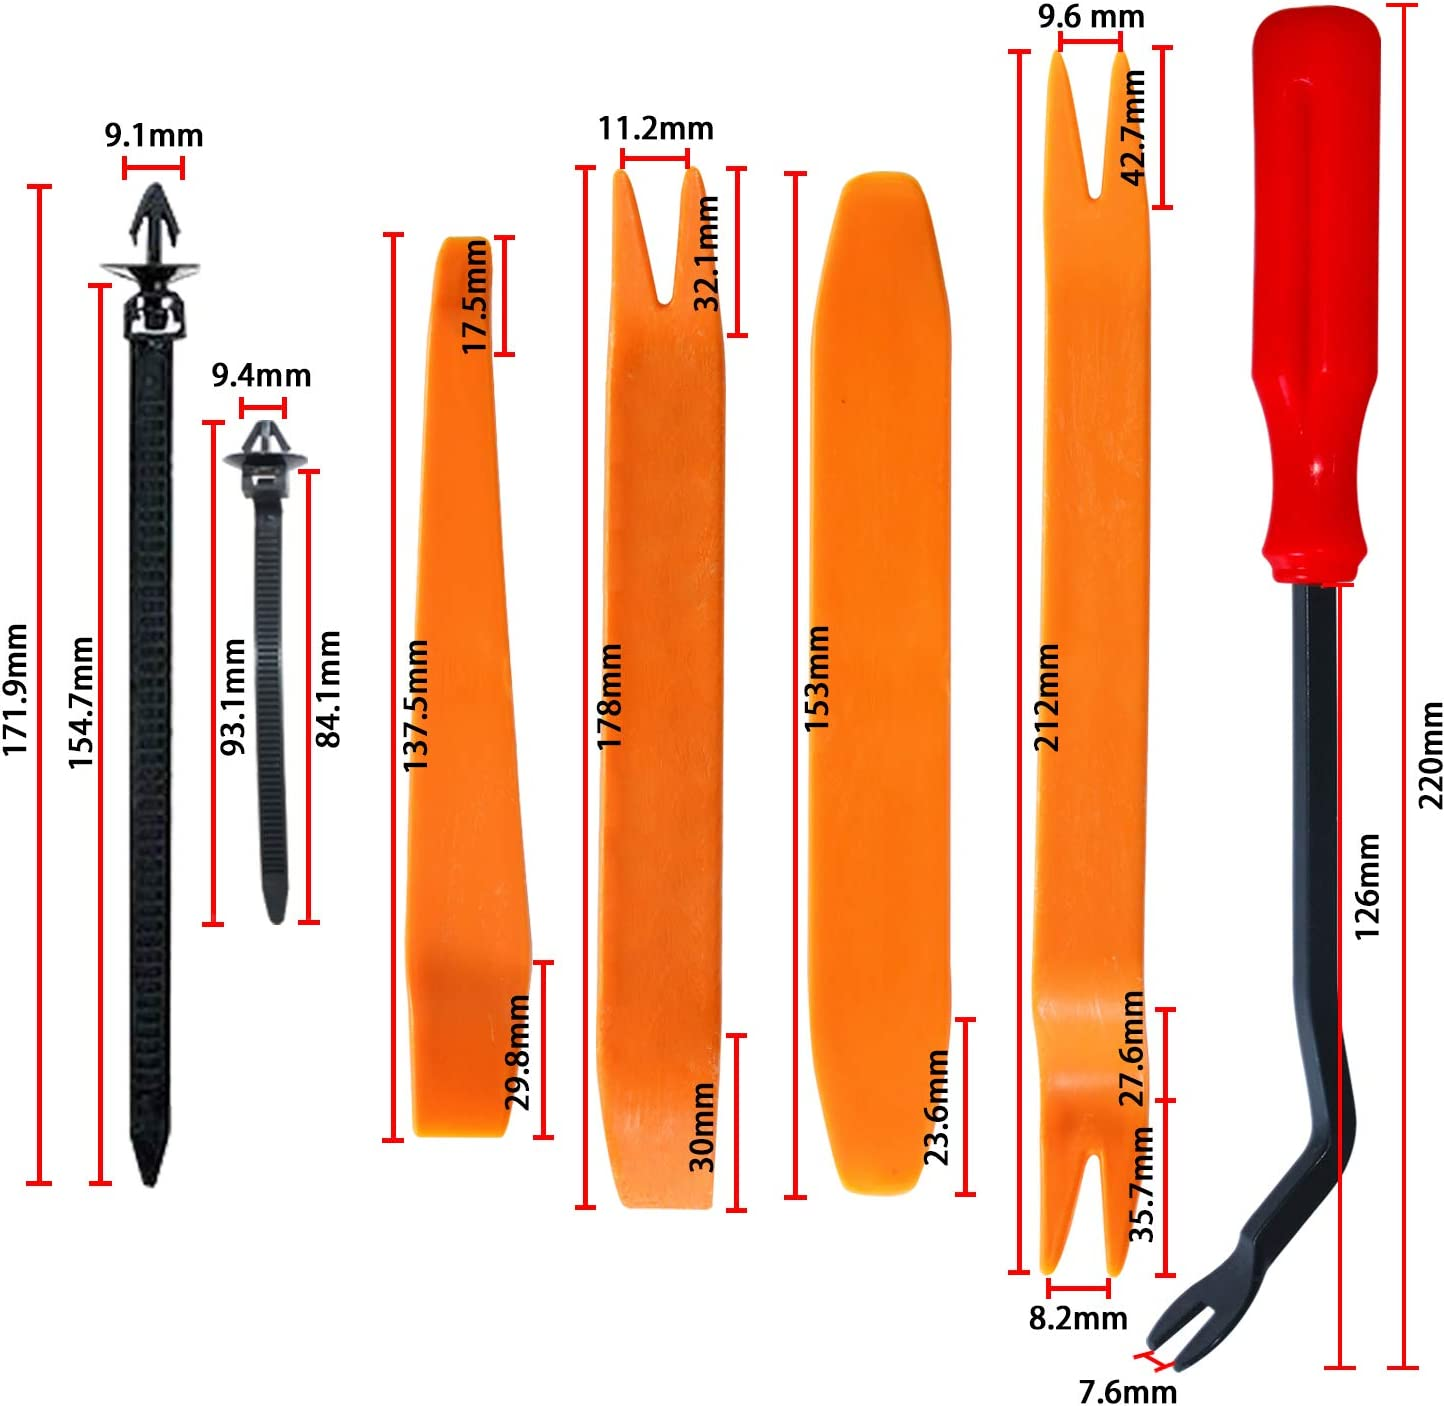 415pcs Auto Body Push Pin Rivet Clips+240pcs Car Trim Panel Body Plastic Fastener Clips Car Trim Removal Tools with 1 Fastener Removal for Toyota GM Ford Honda Lexus MR2 Chrysler